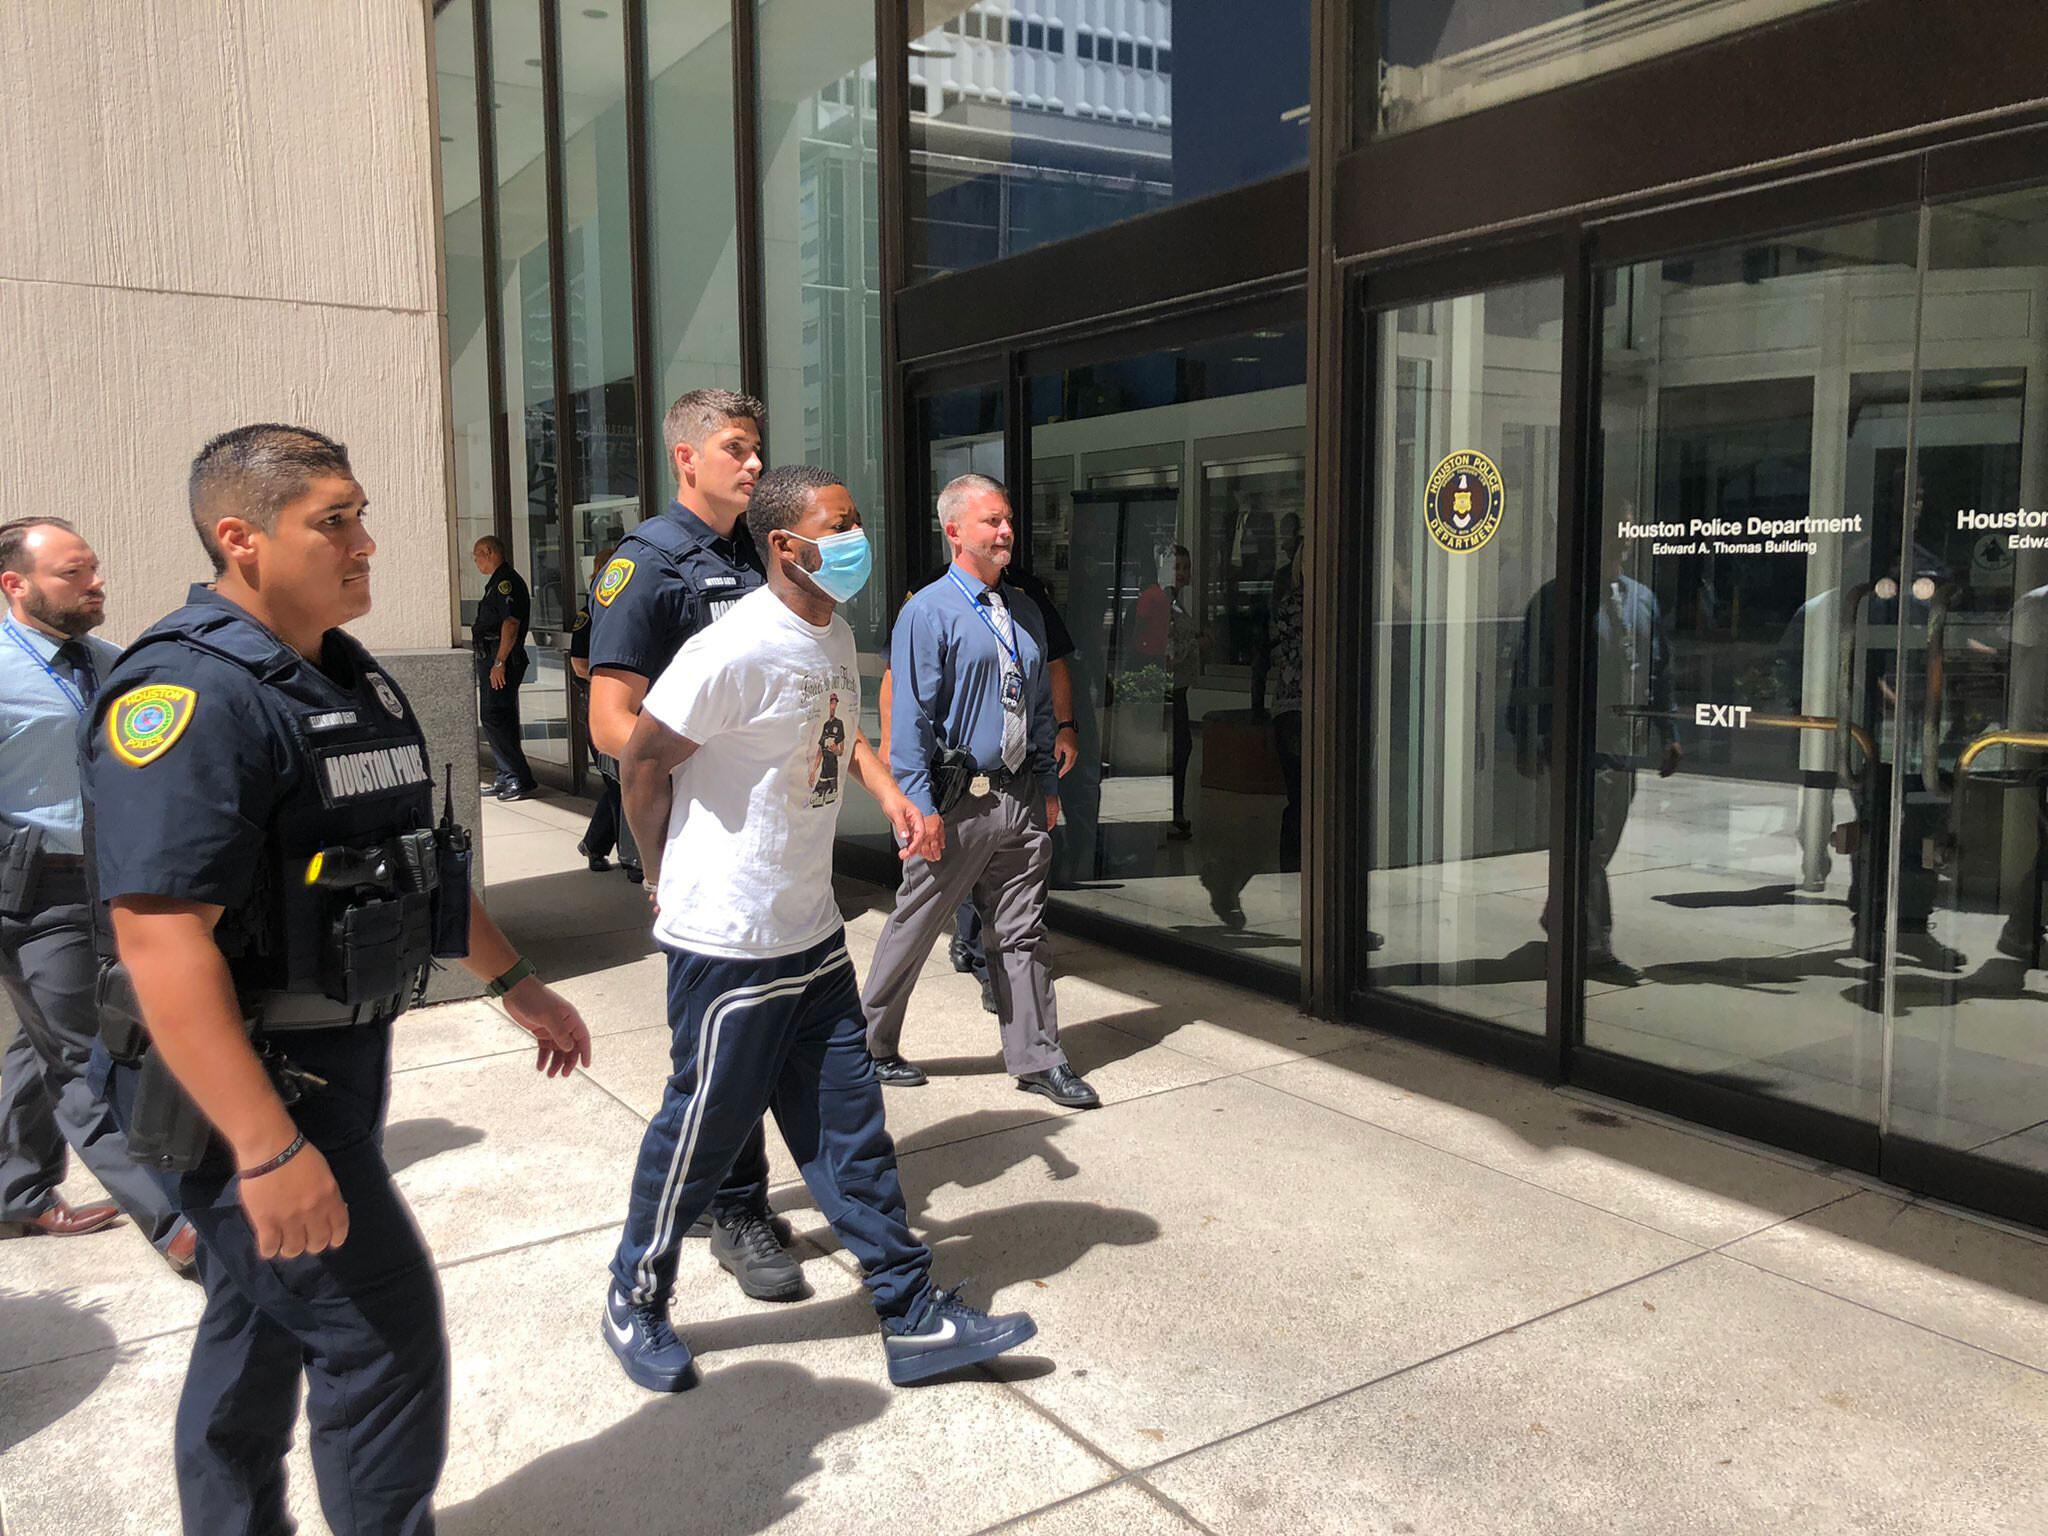 Man arrested in Houston road rage killing